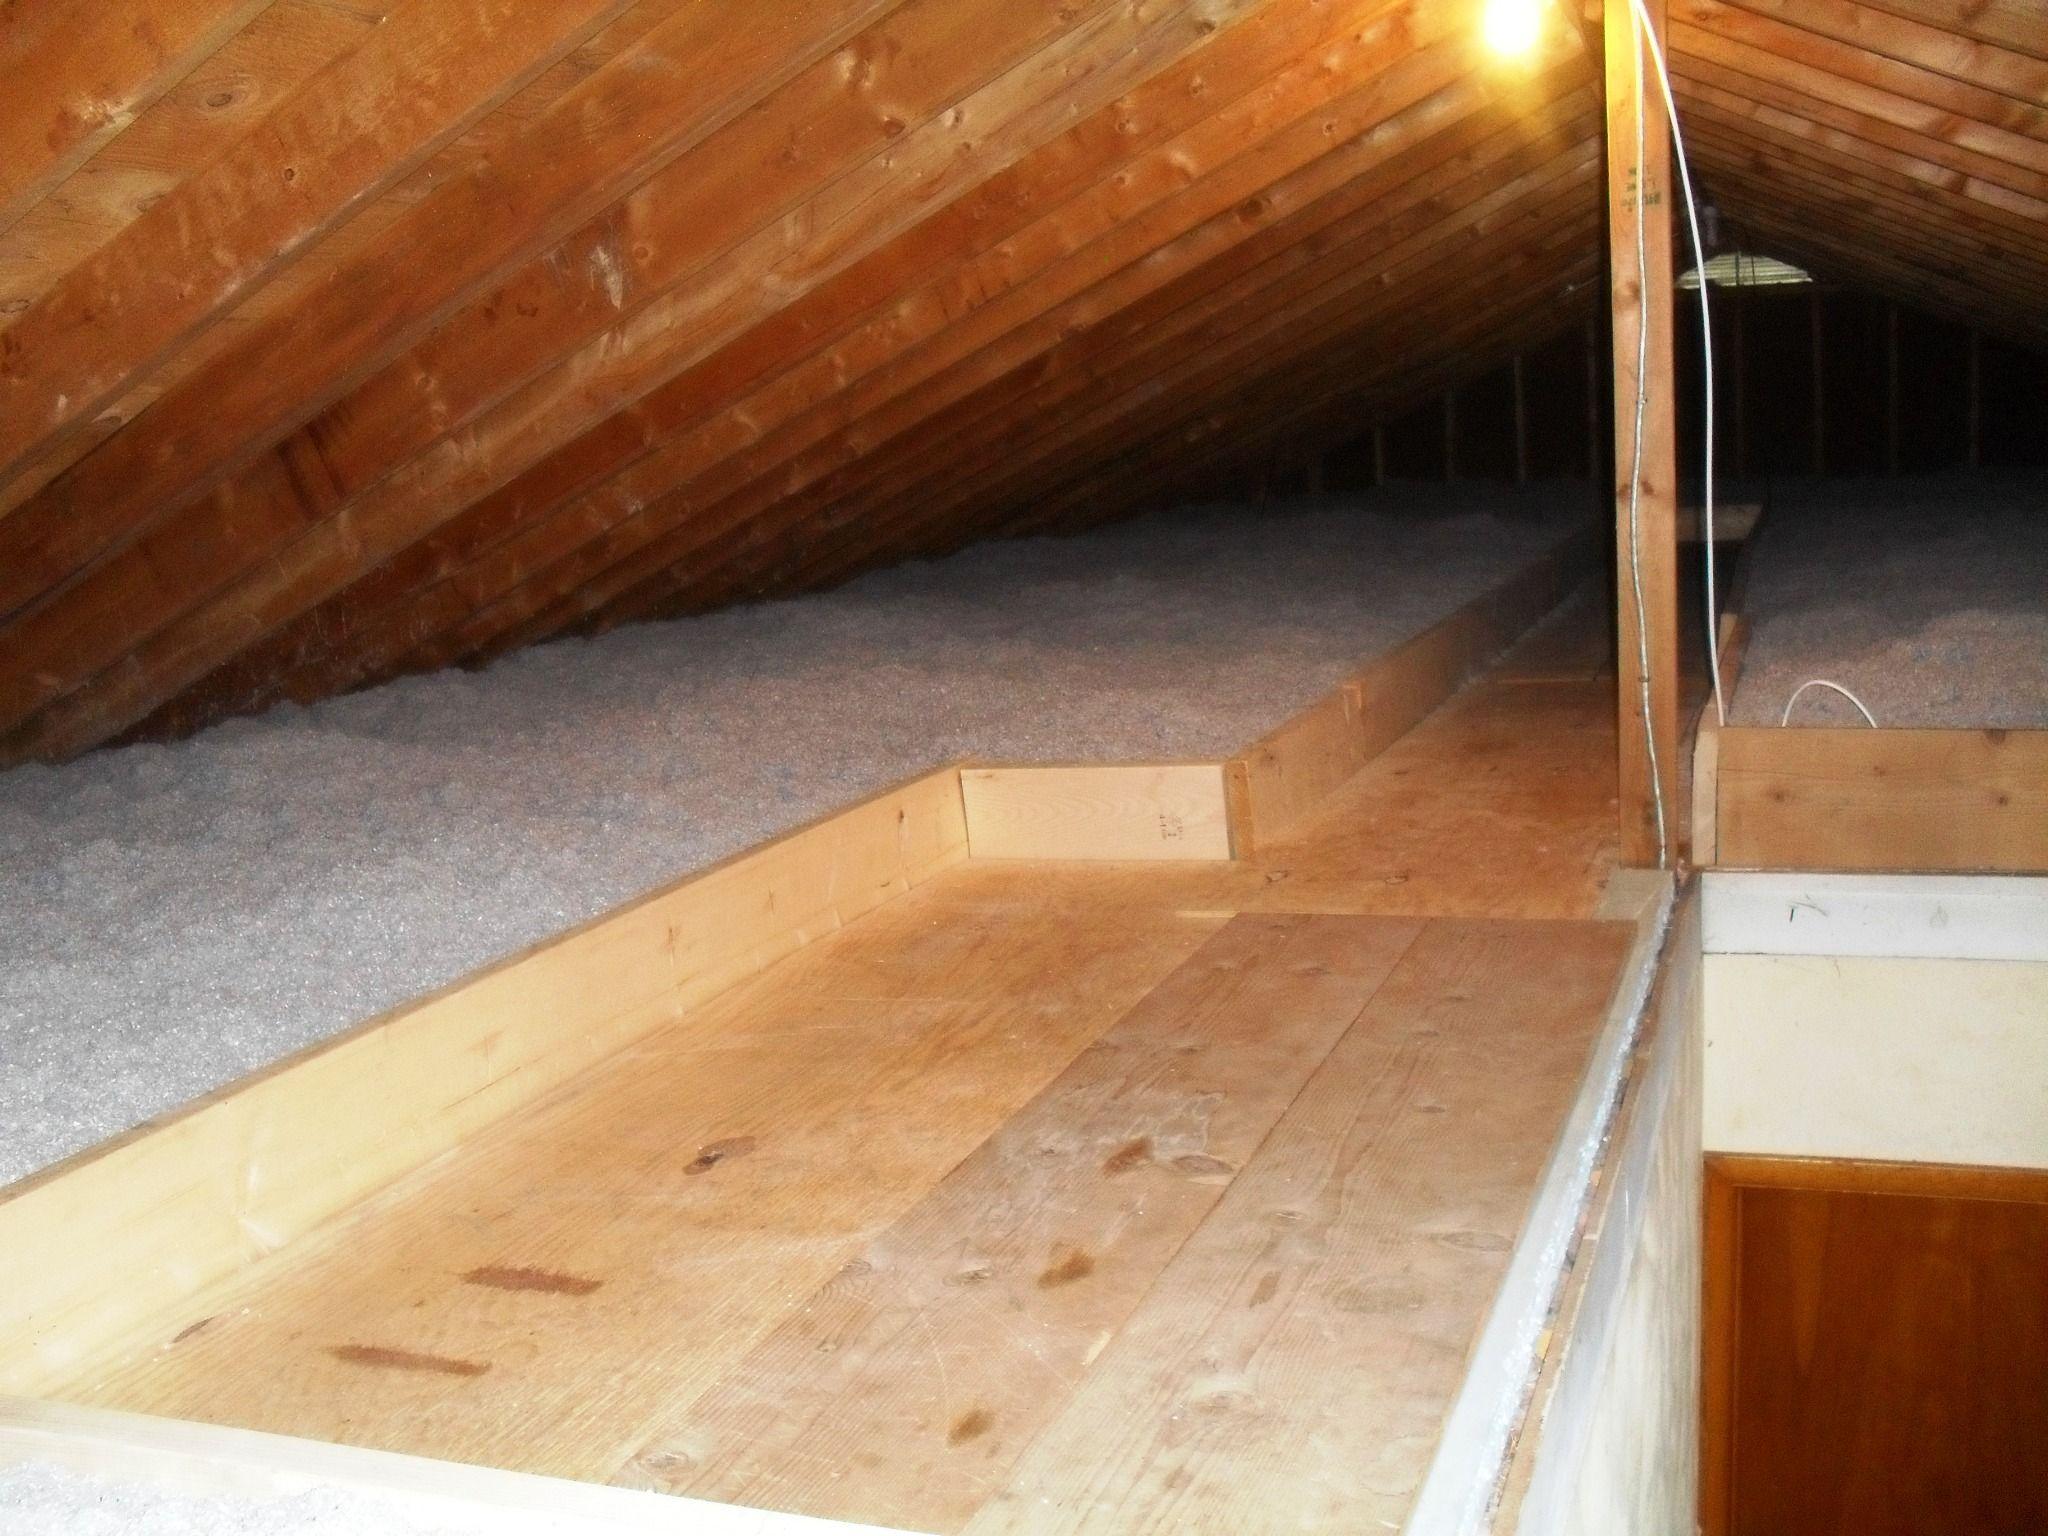 Air sealing the attic. By Michael kerbs Home improvement